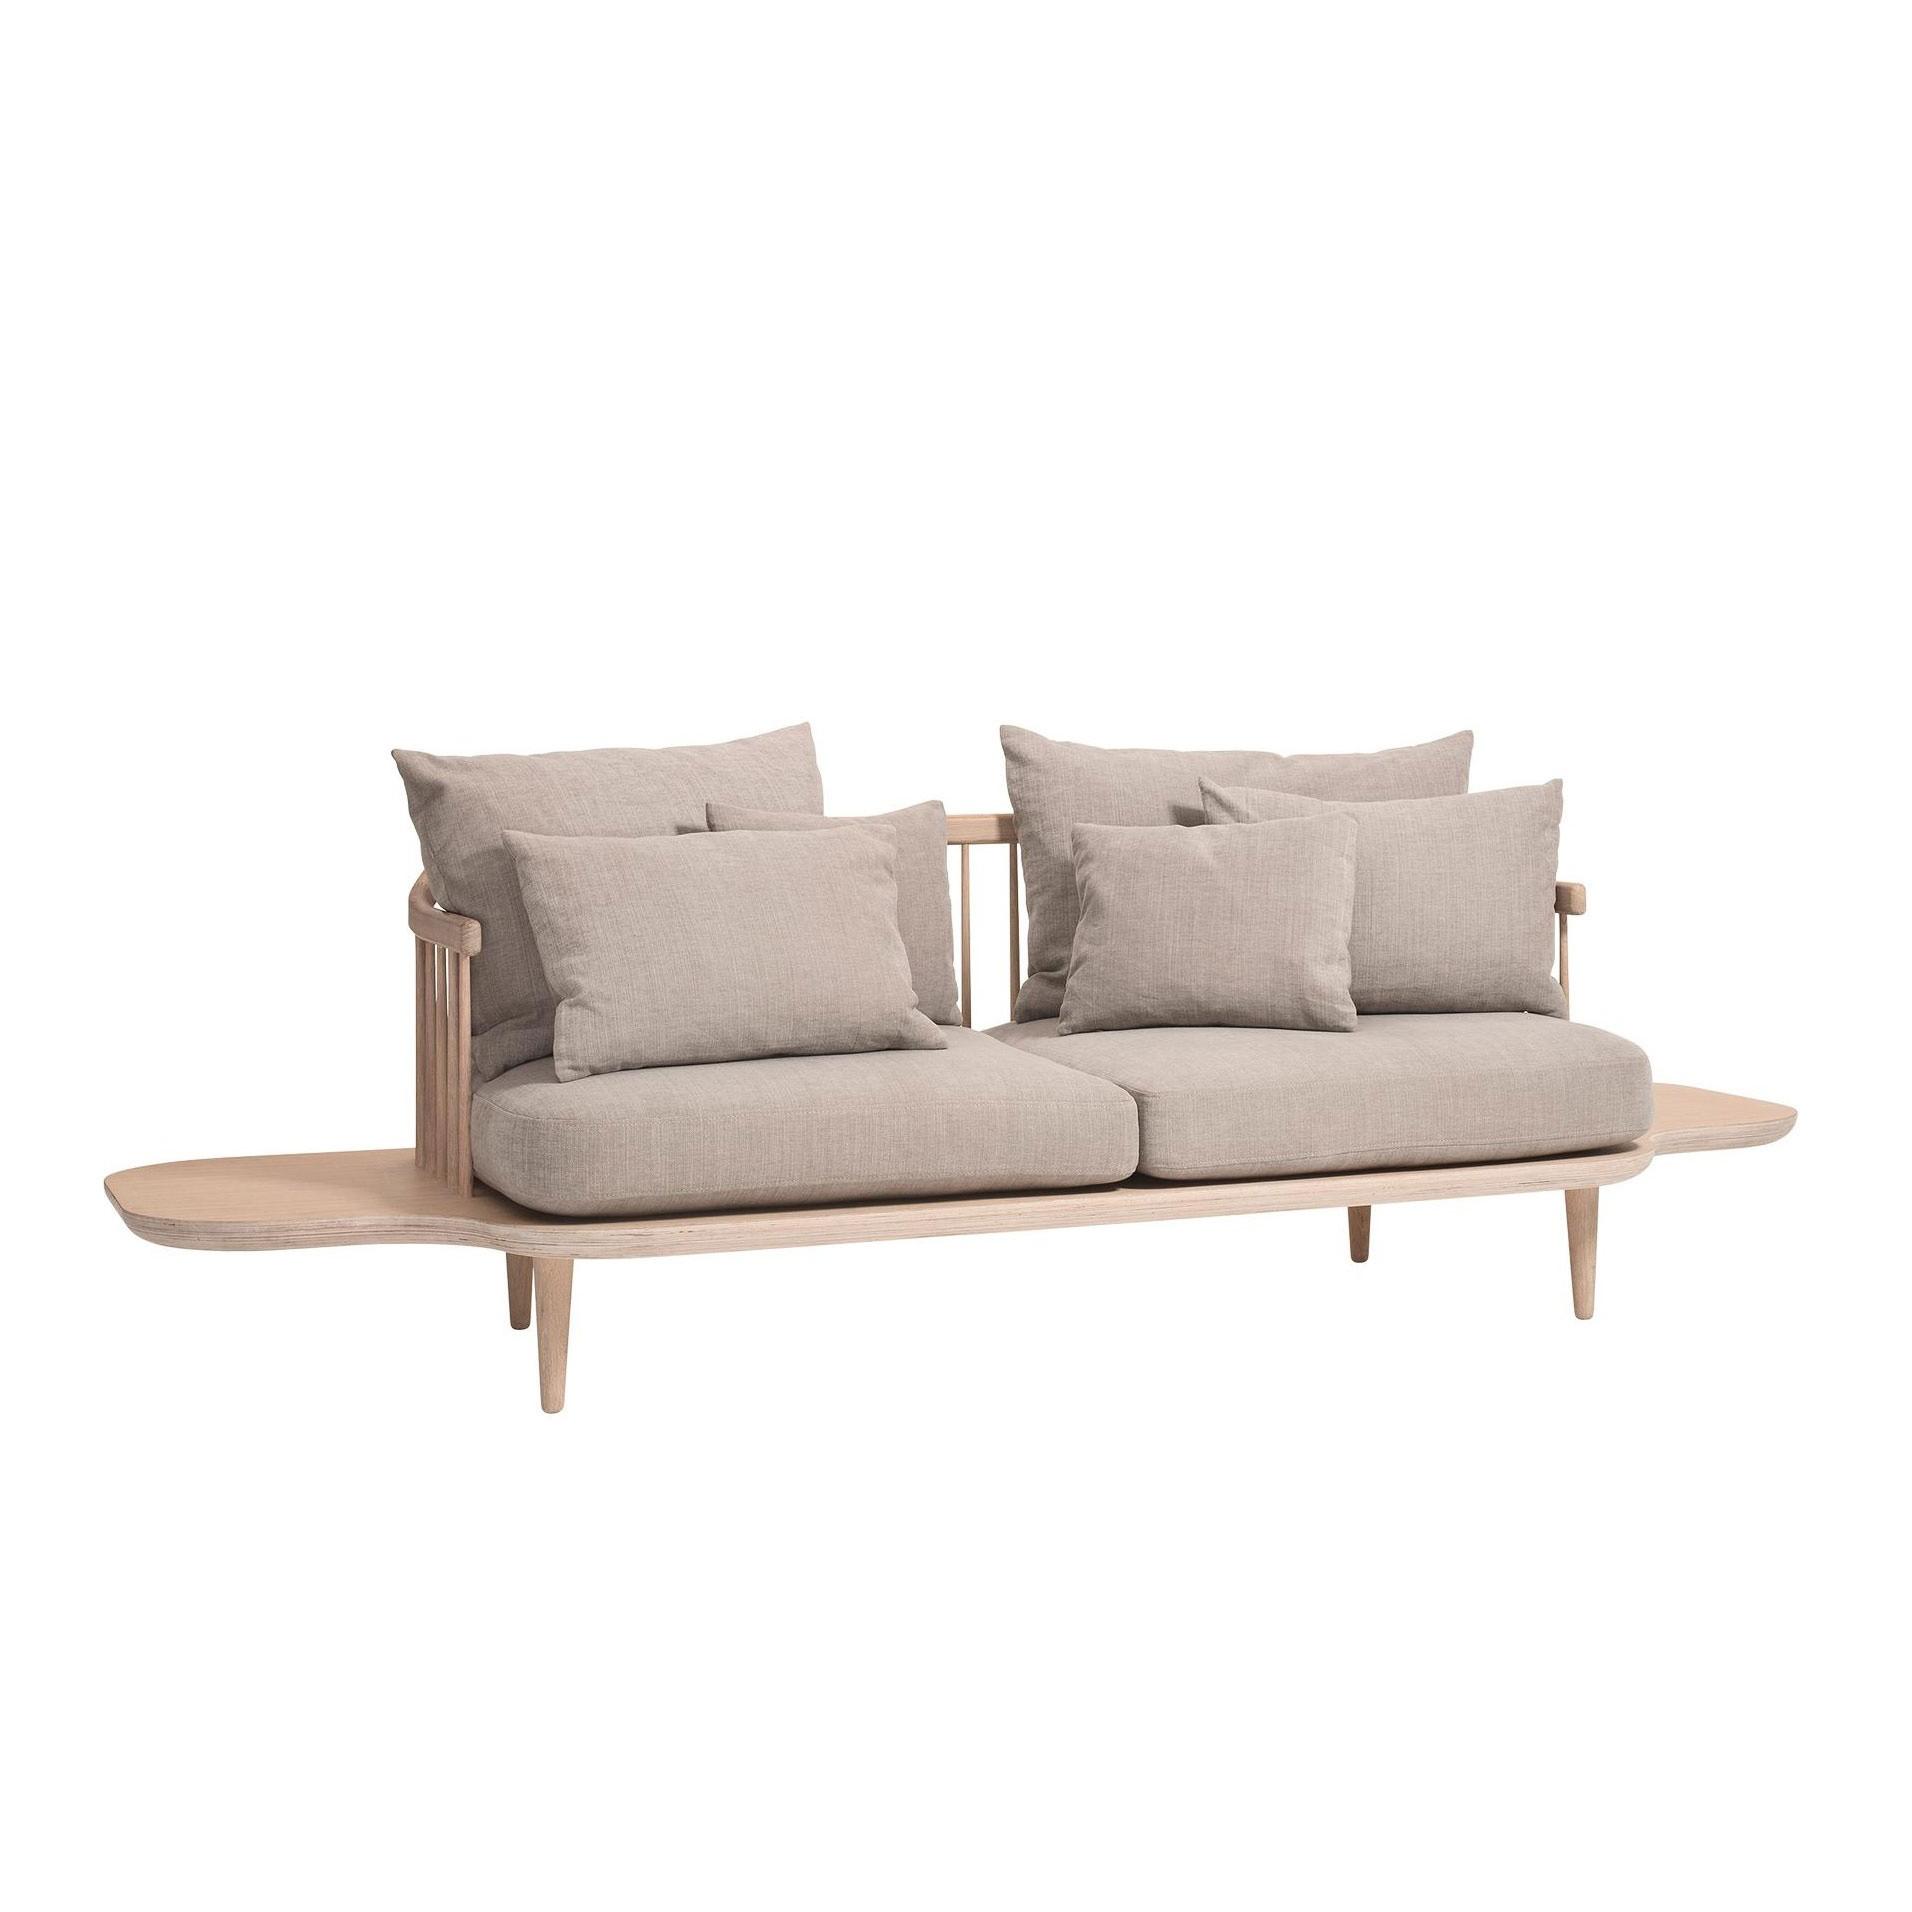 Terrific Fly Sc3 2 Seater Sofa With Side Tables Inzonedesignstudio Interior Chair Design Inzonedesignstudiocom